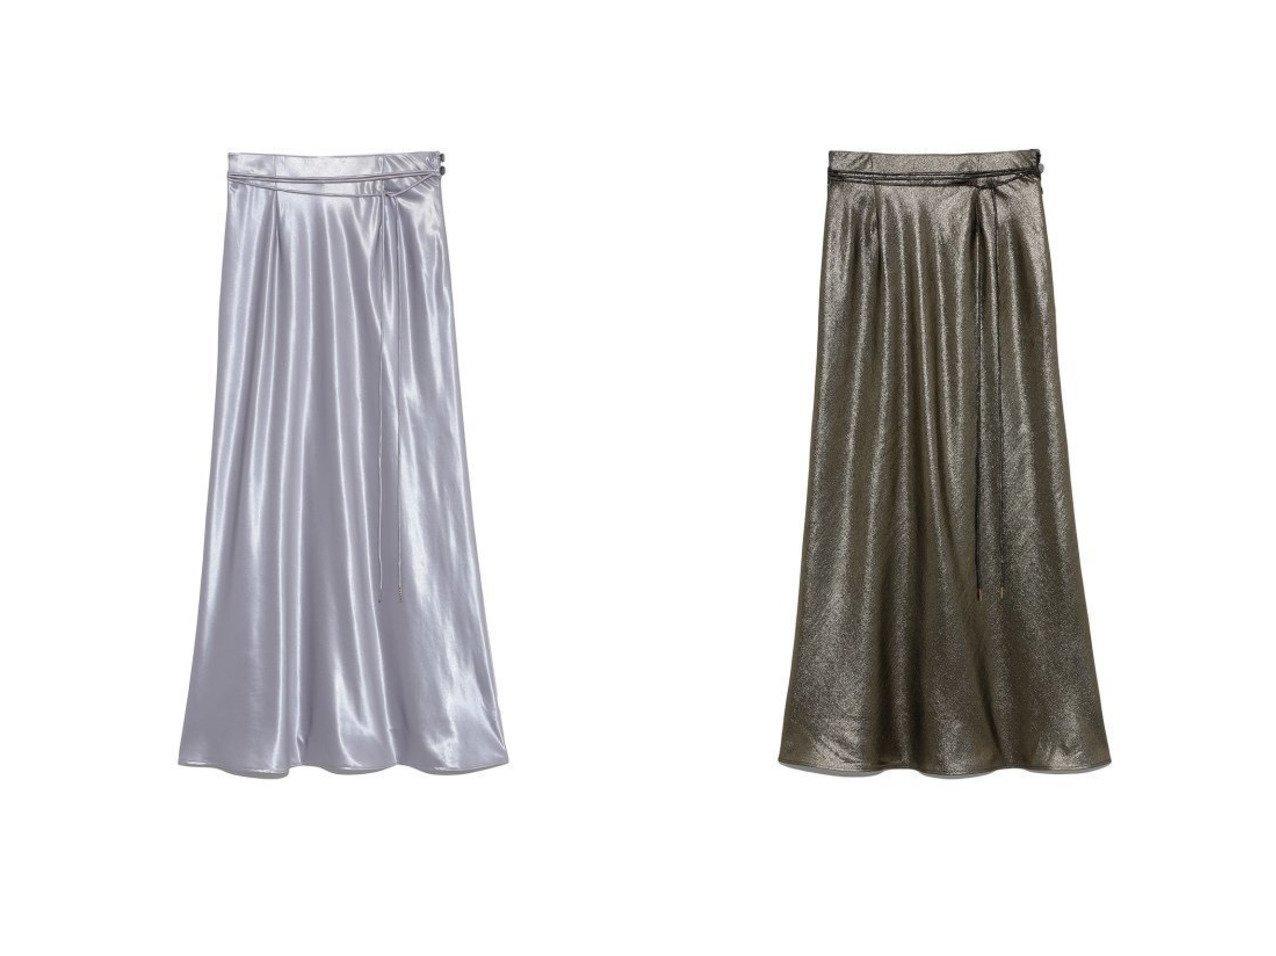 【Lily Brown/リリーブラウン】のシャイニーロングスカート 【スカート】おすすめ!人気、トレンド・レディースファッションの通販 おすすめで人気の流行・トレンド、ファッションの通販商品 メンズファッション・キッズファッション・インテリア・家具・レディースファッション・服の通販 founy(ファニー) https://founy.com/ ファッション Fashion レディースファッション WOMEN スカート Skirt ロングスカート Long Skirt グリッター サテン シルク シンプル スマート トレンド なめらか フィット ラベンダー リメイク ロング |ID:crp329100000035442